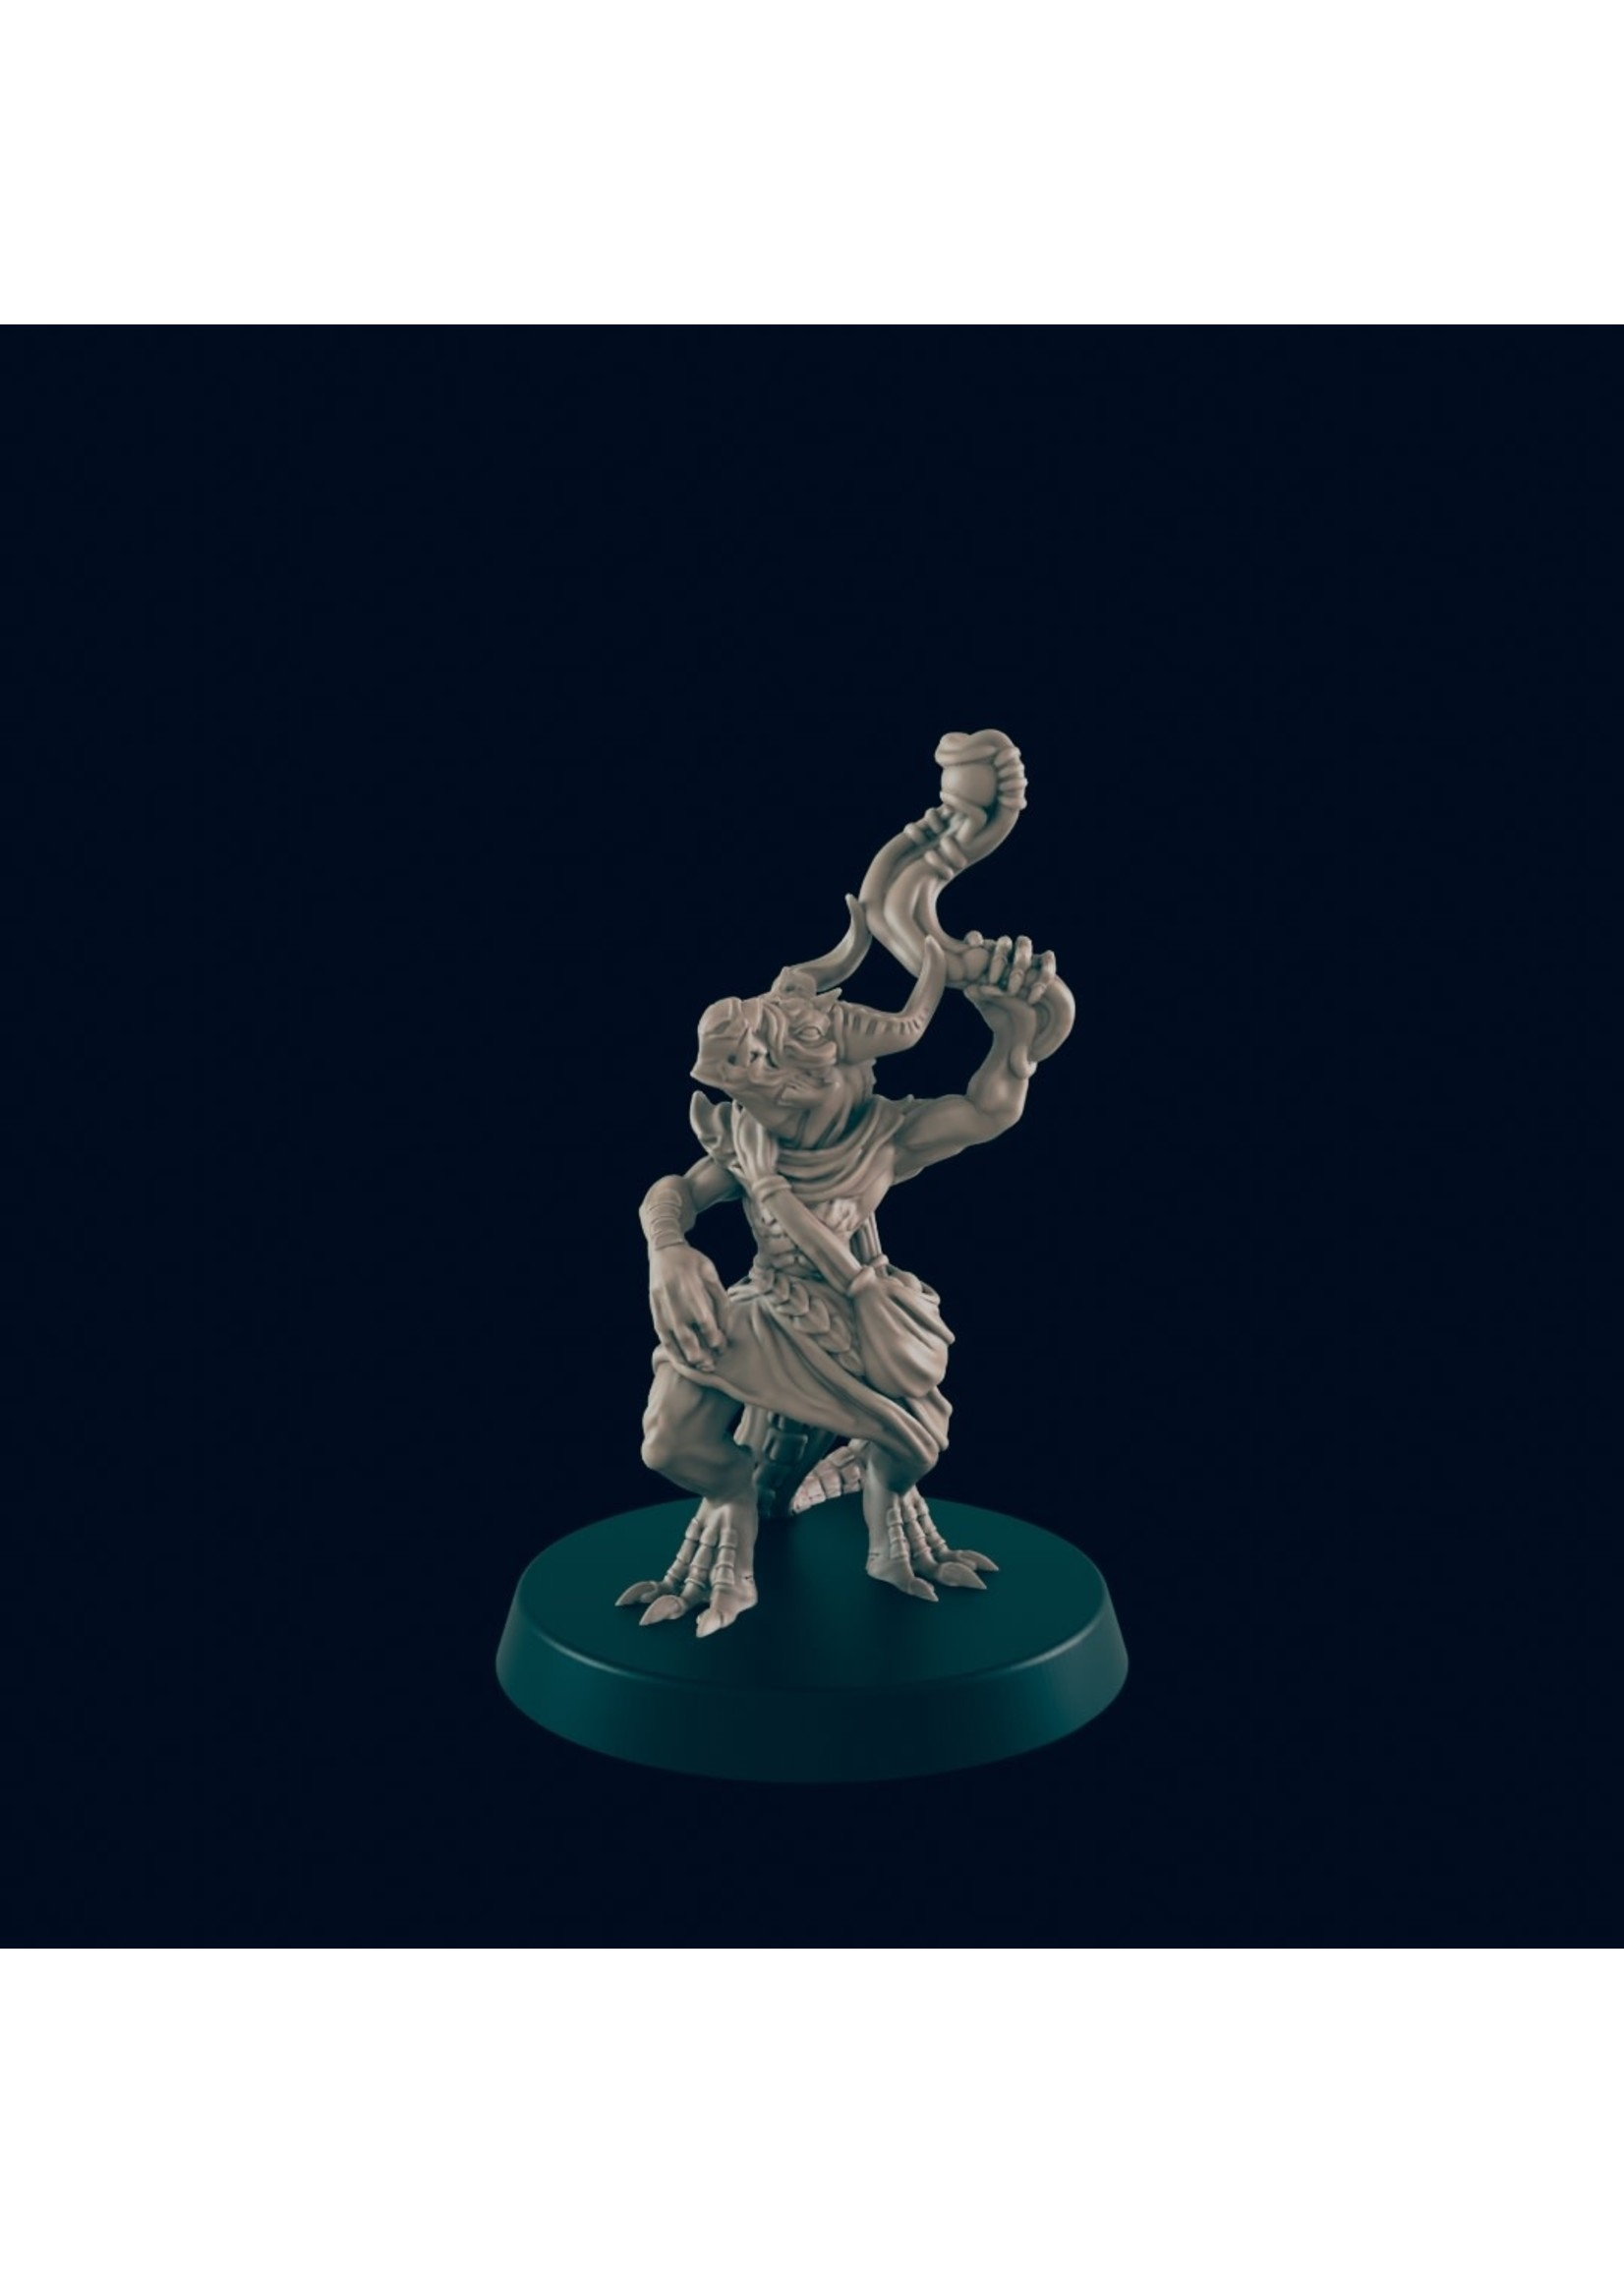 3D Printed Miniature - Kobold 3 - Dungeons & Dragons - Beasts and Baddies KS